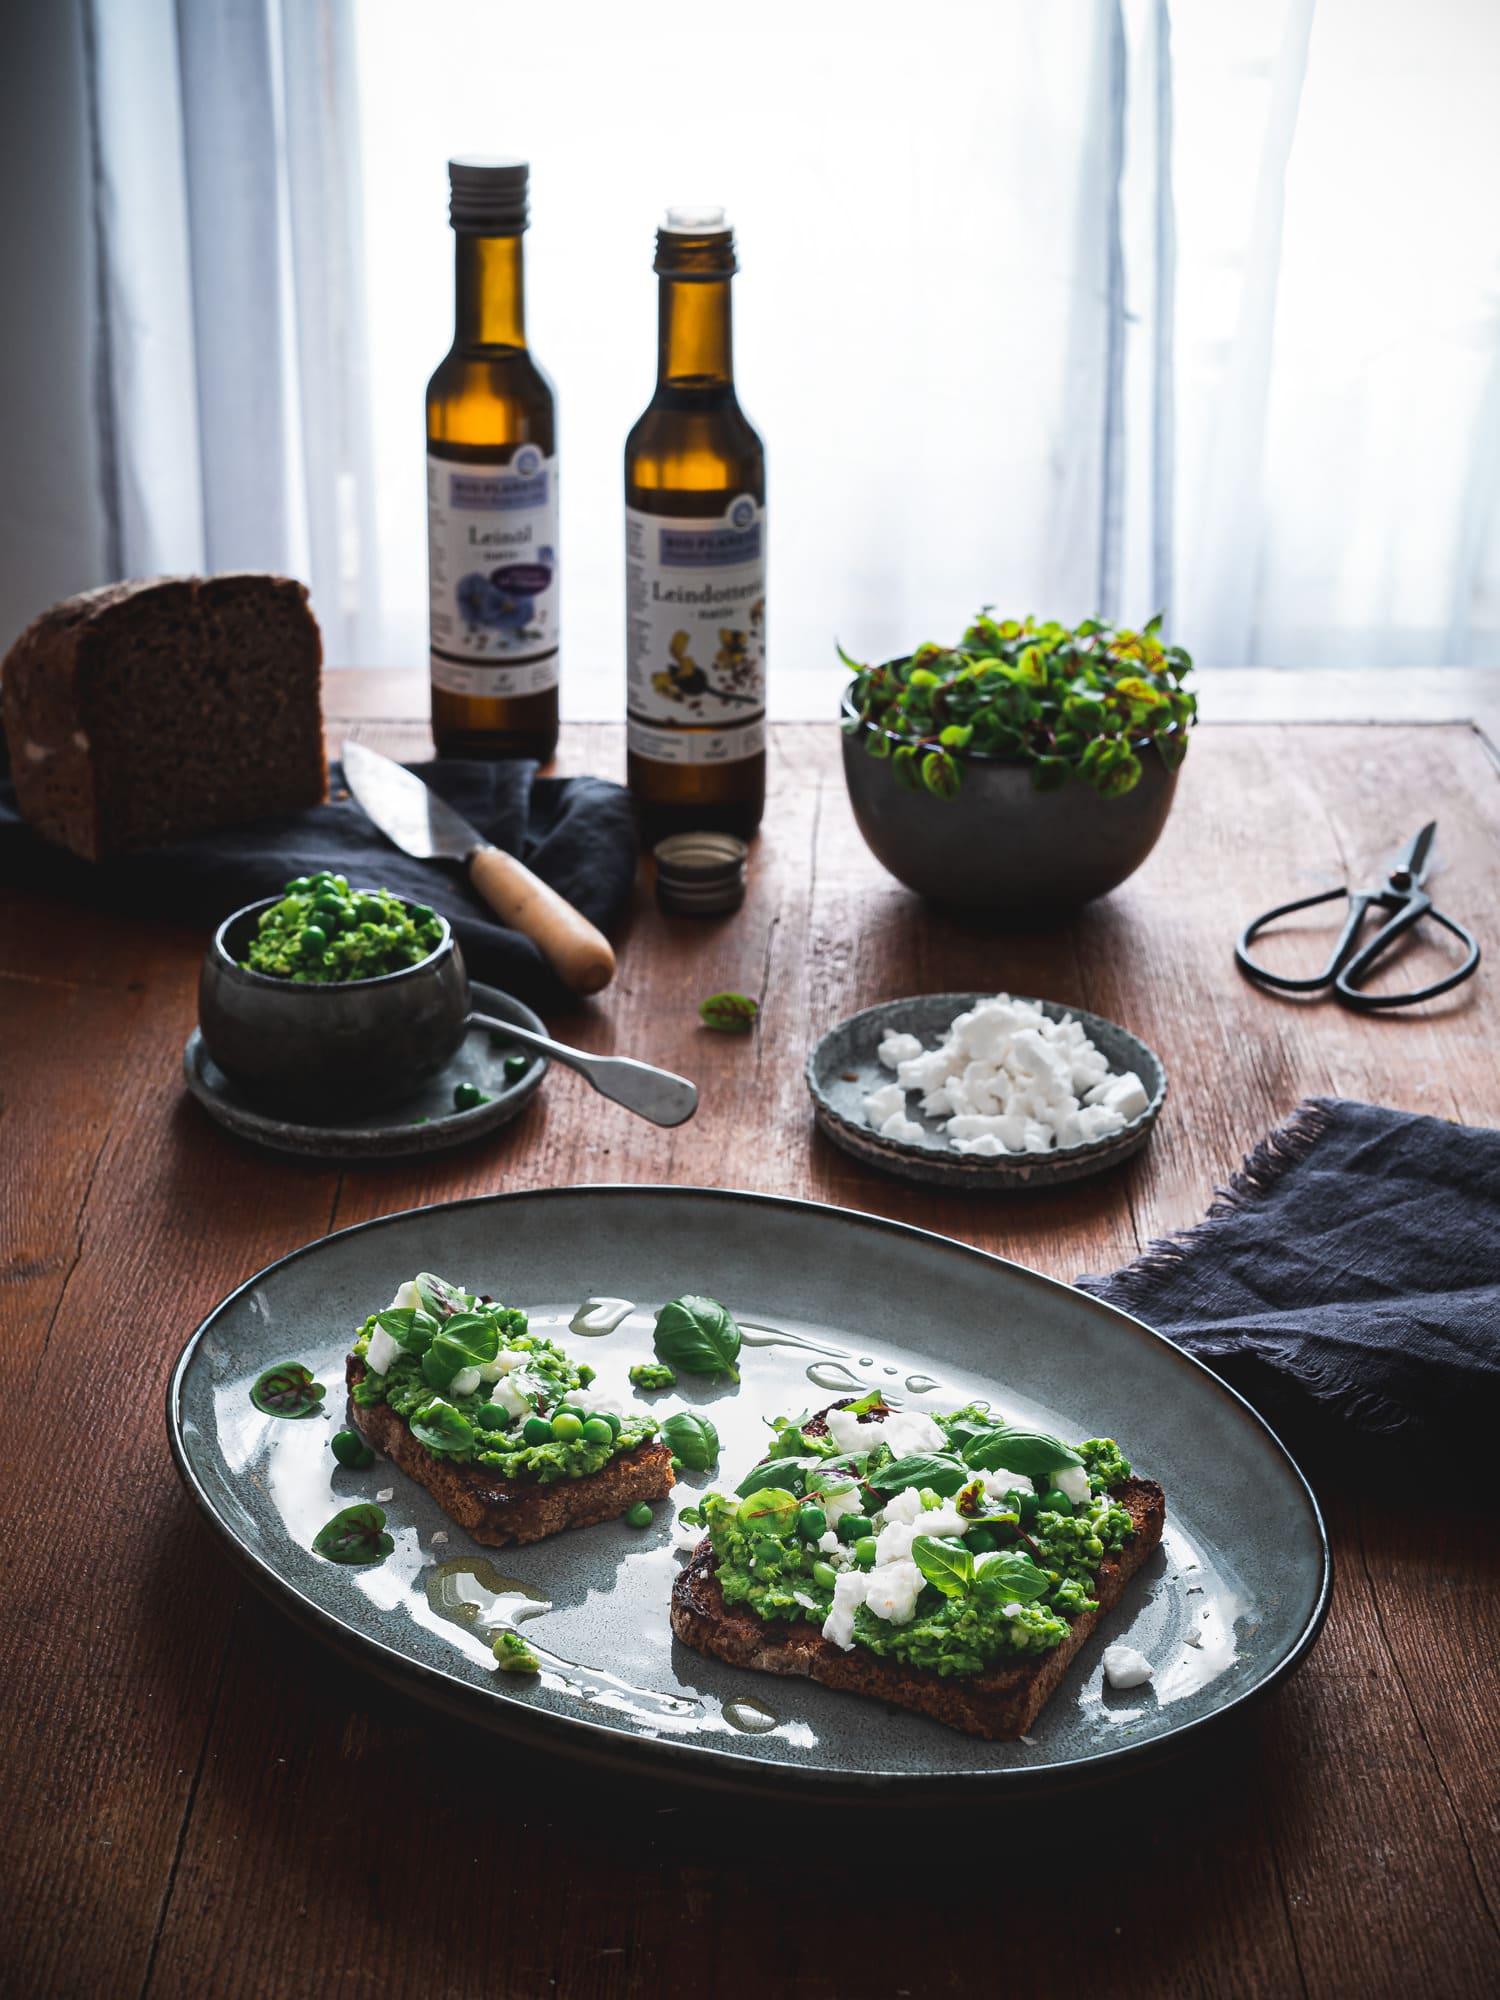 Leindotteröl und Leinöl mit Erbsenpüree, gerösteten Brot, veganem Feta und Basilikum